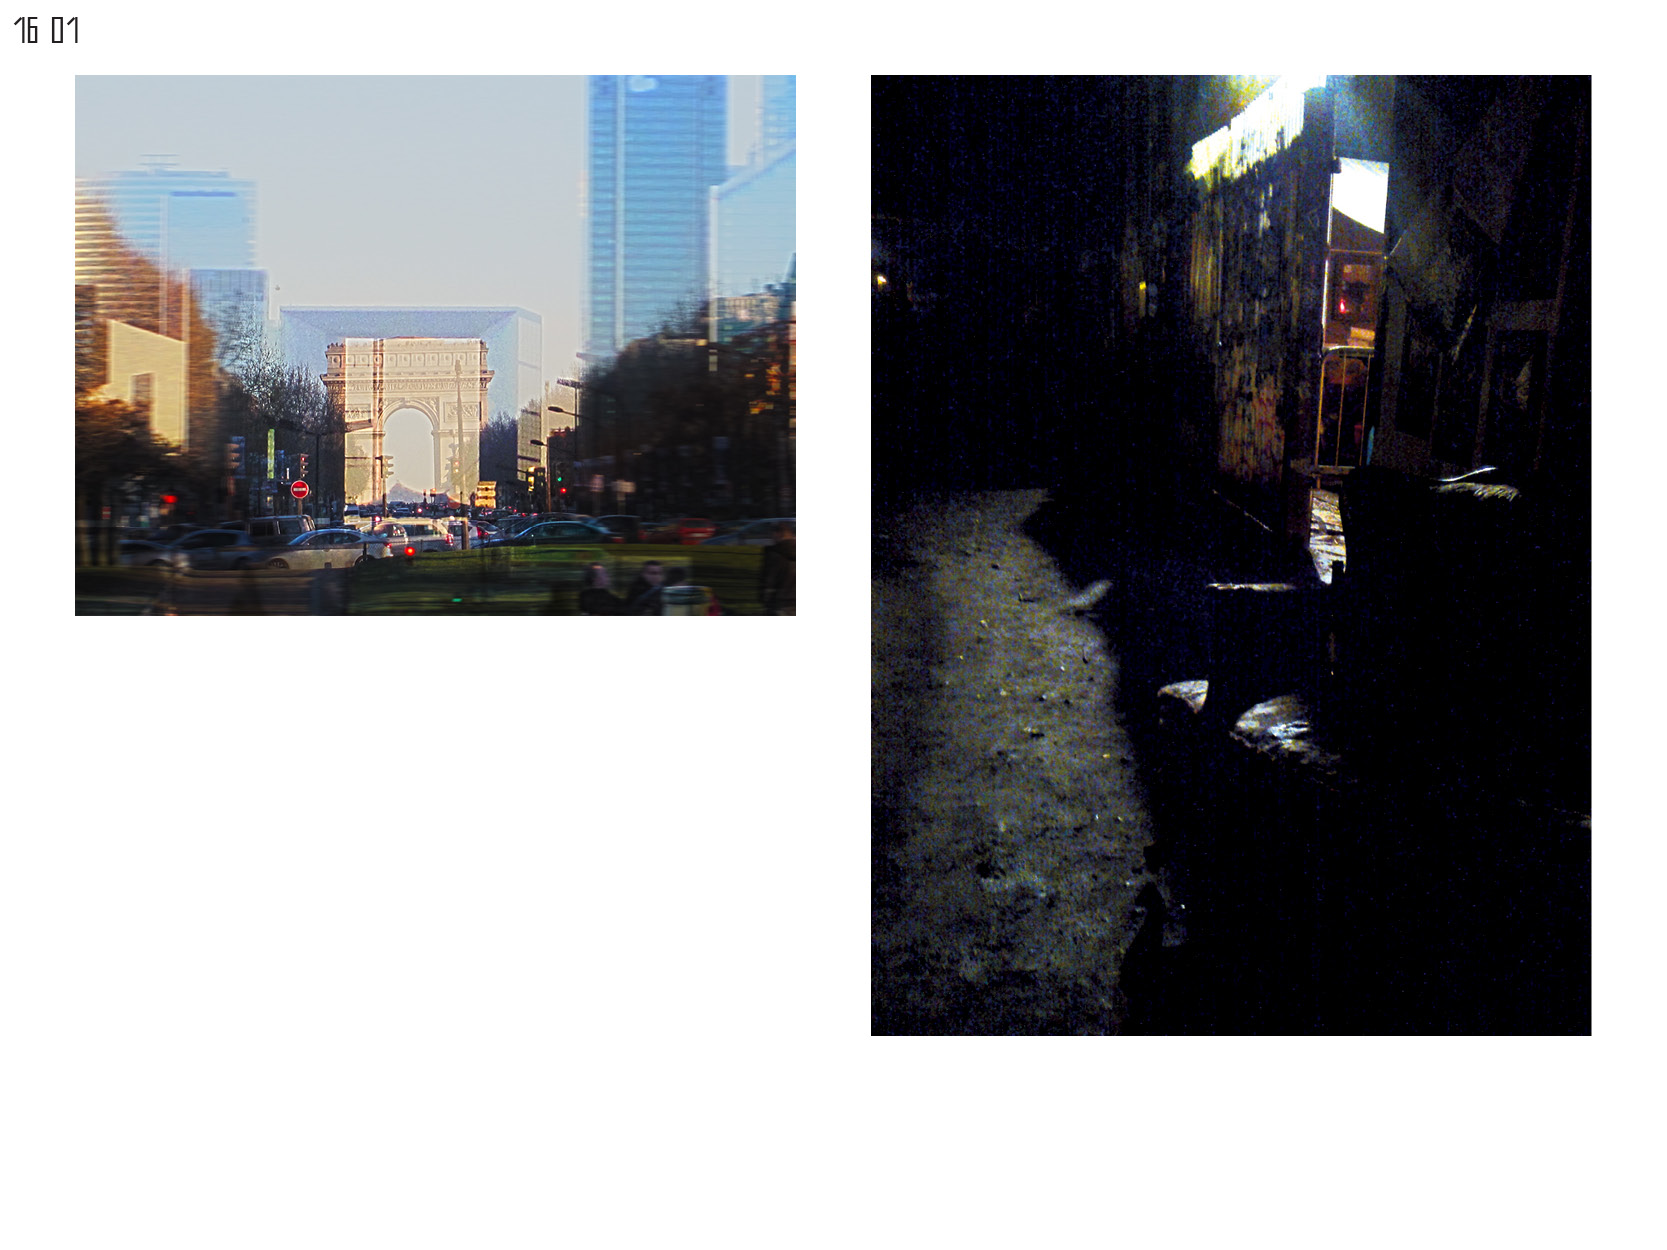 Gerrit-Schweiger-Dialog-Städte-Paris-Berlin-Jessica-Blank-Experiment-Fotoserie-Tagebuch-visuelle-Kommunikation-77